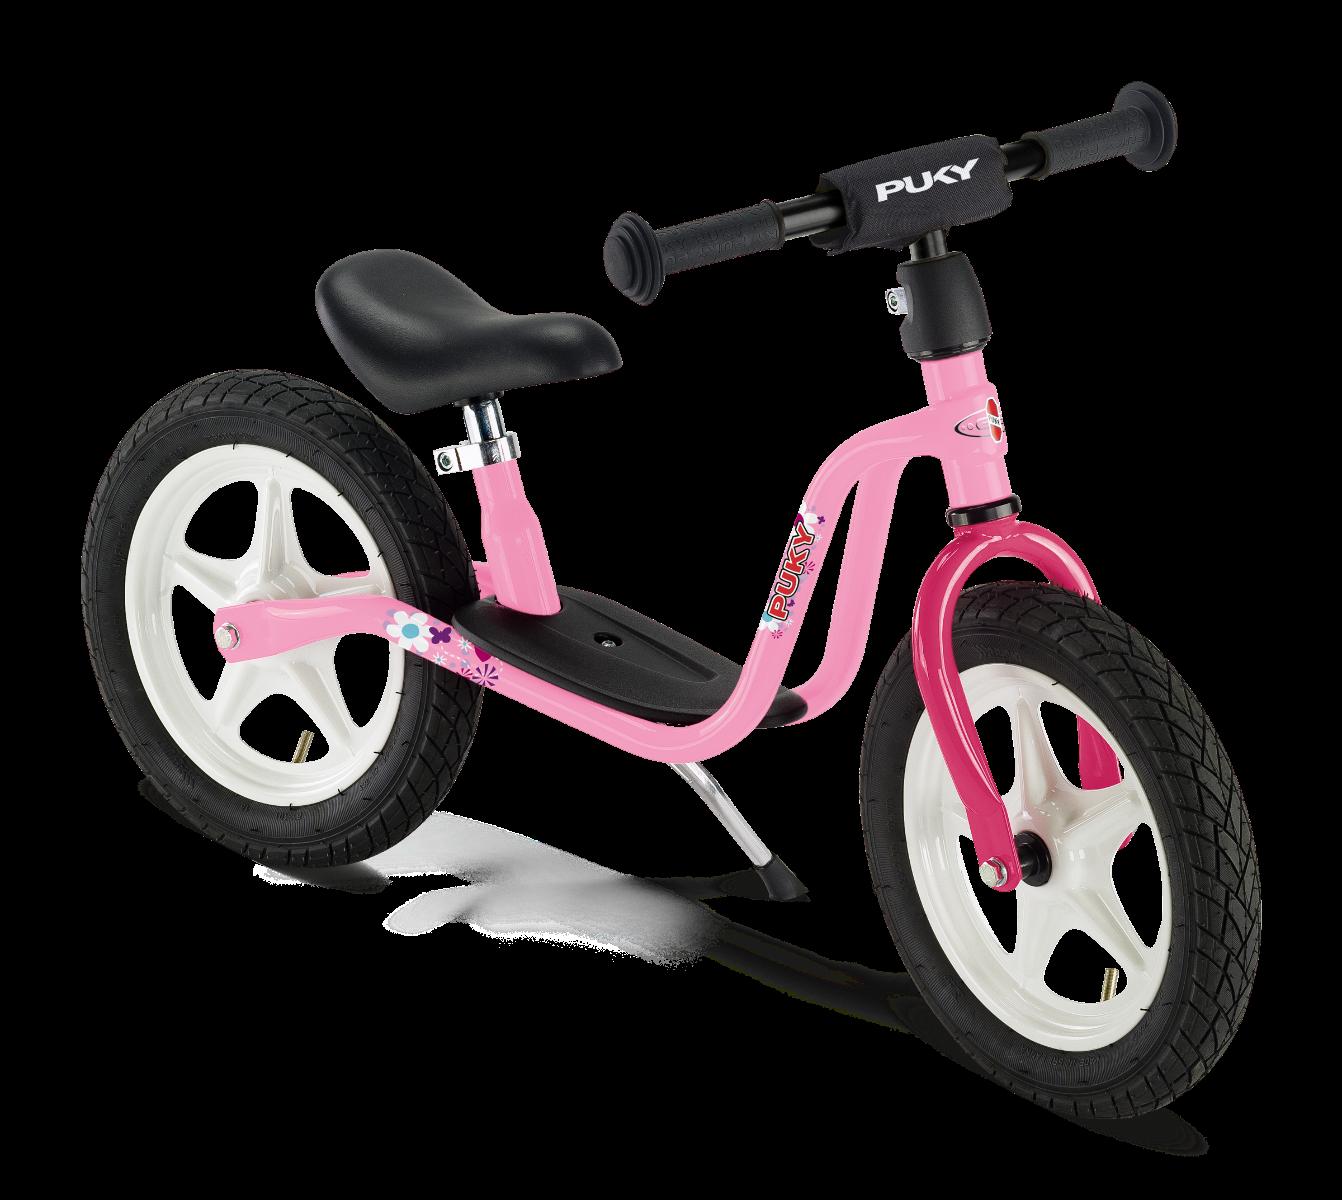 PUKY - LR 1 L Balance Bike - Pink (4066)